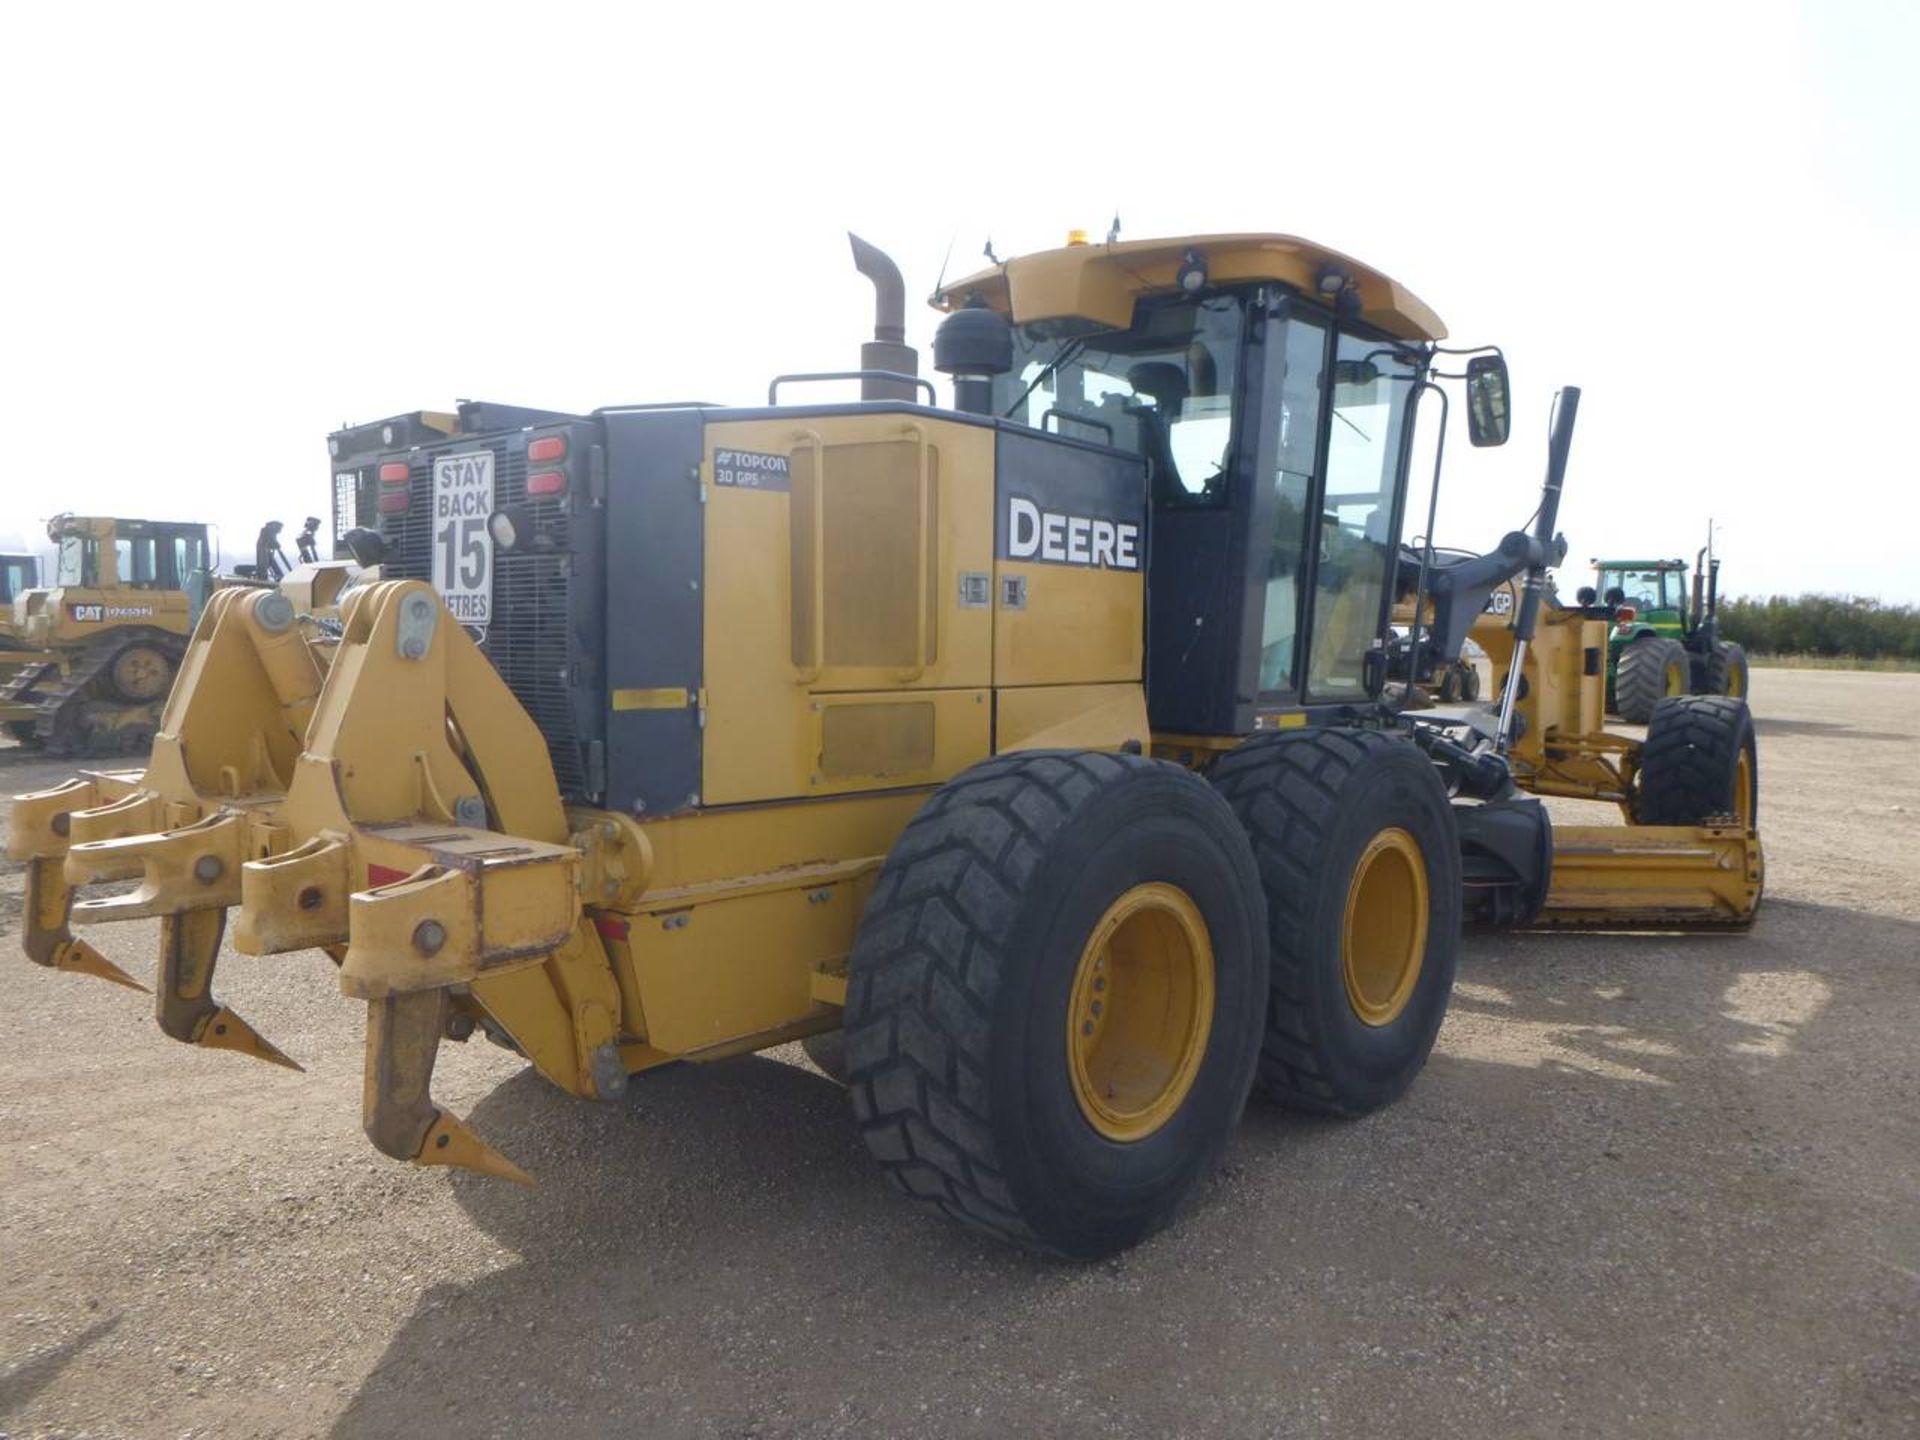 2010 John Deere 872GP Grader - Image 3 of 11